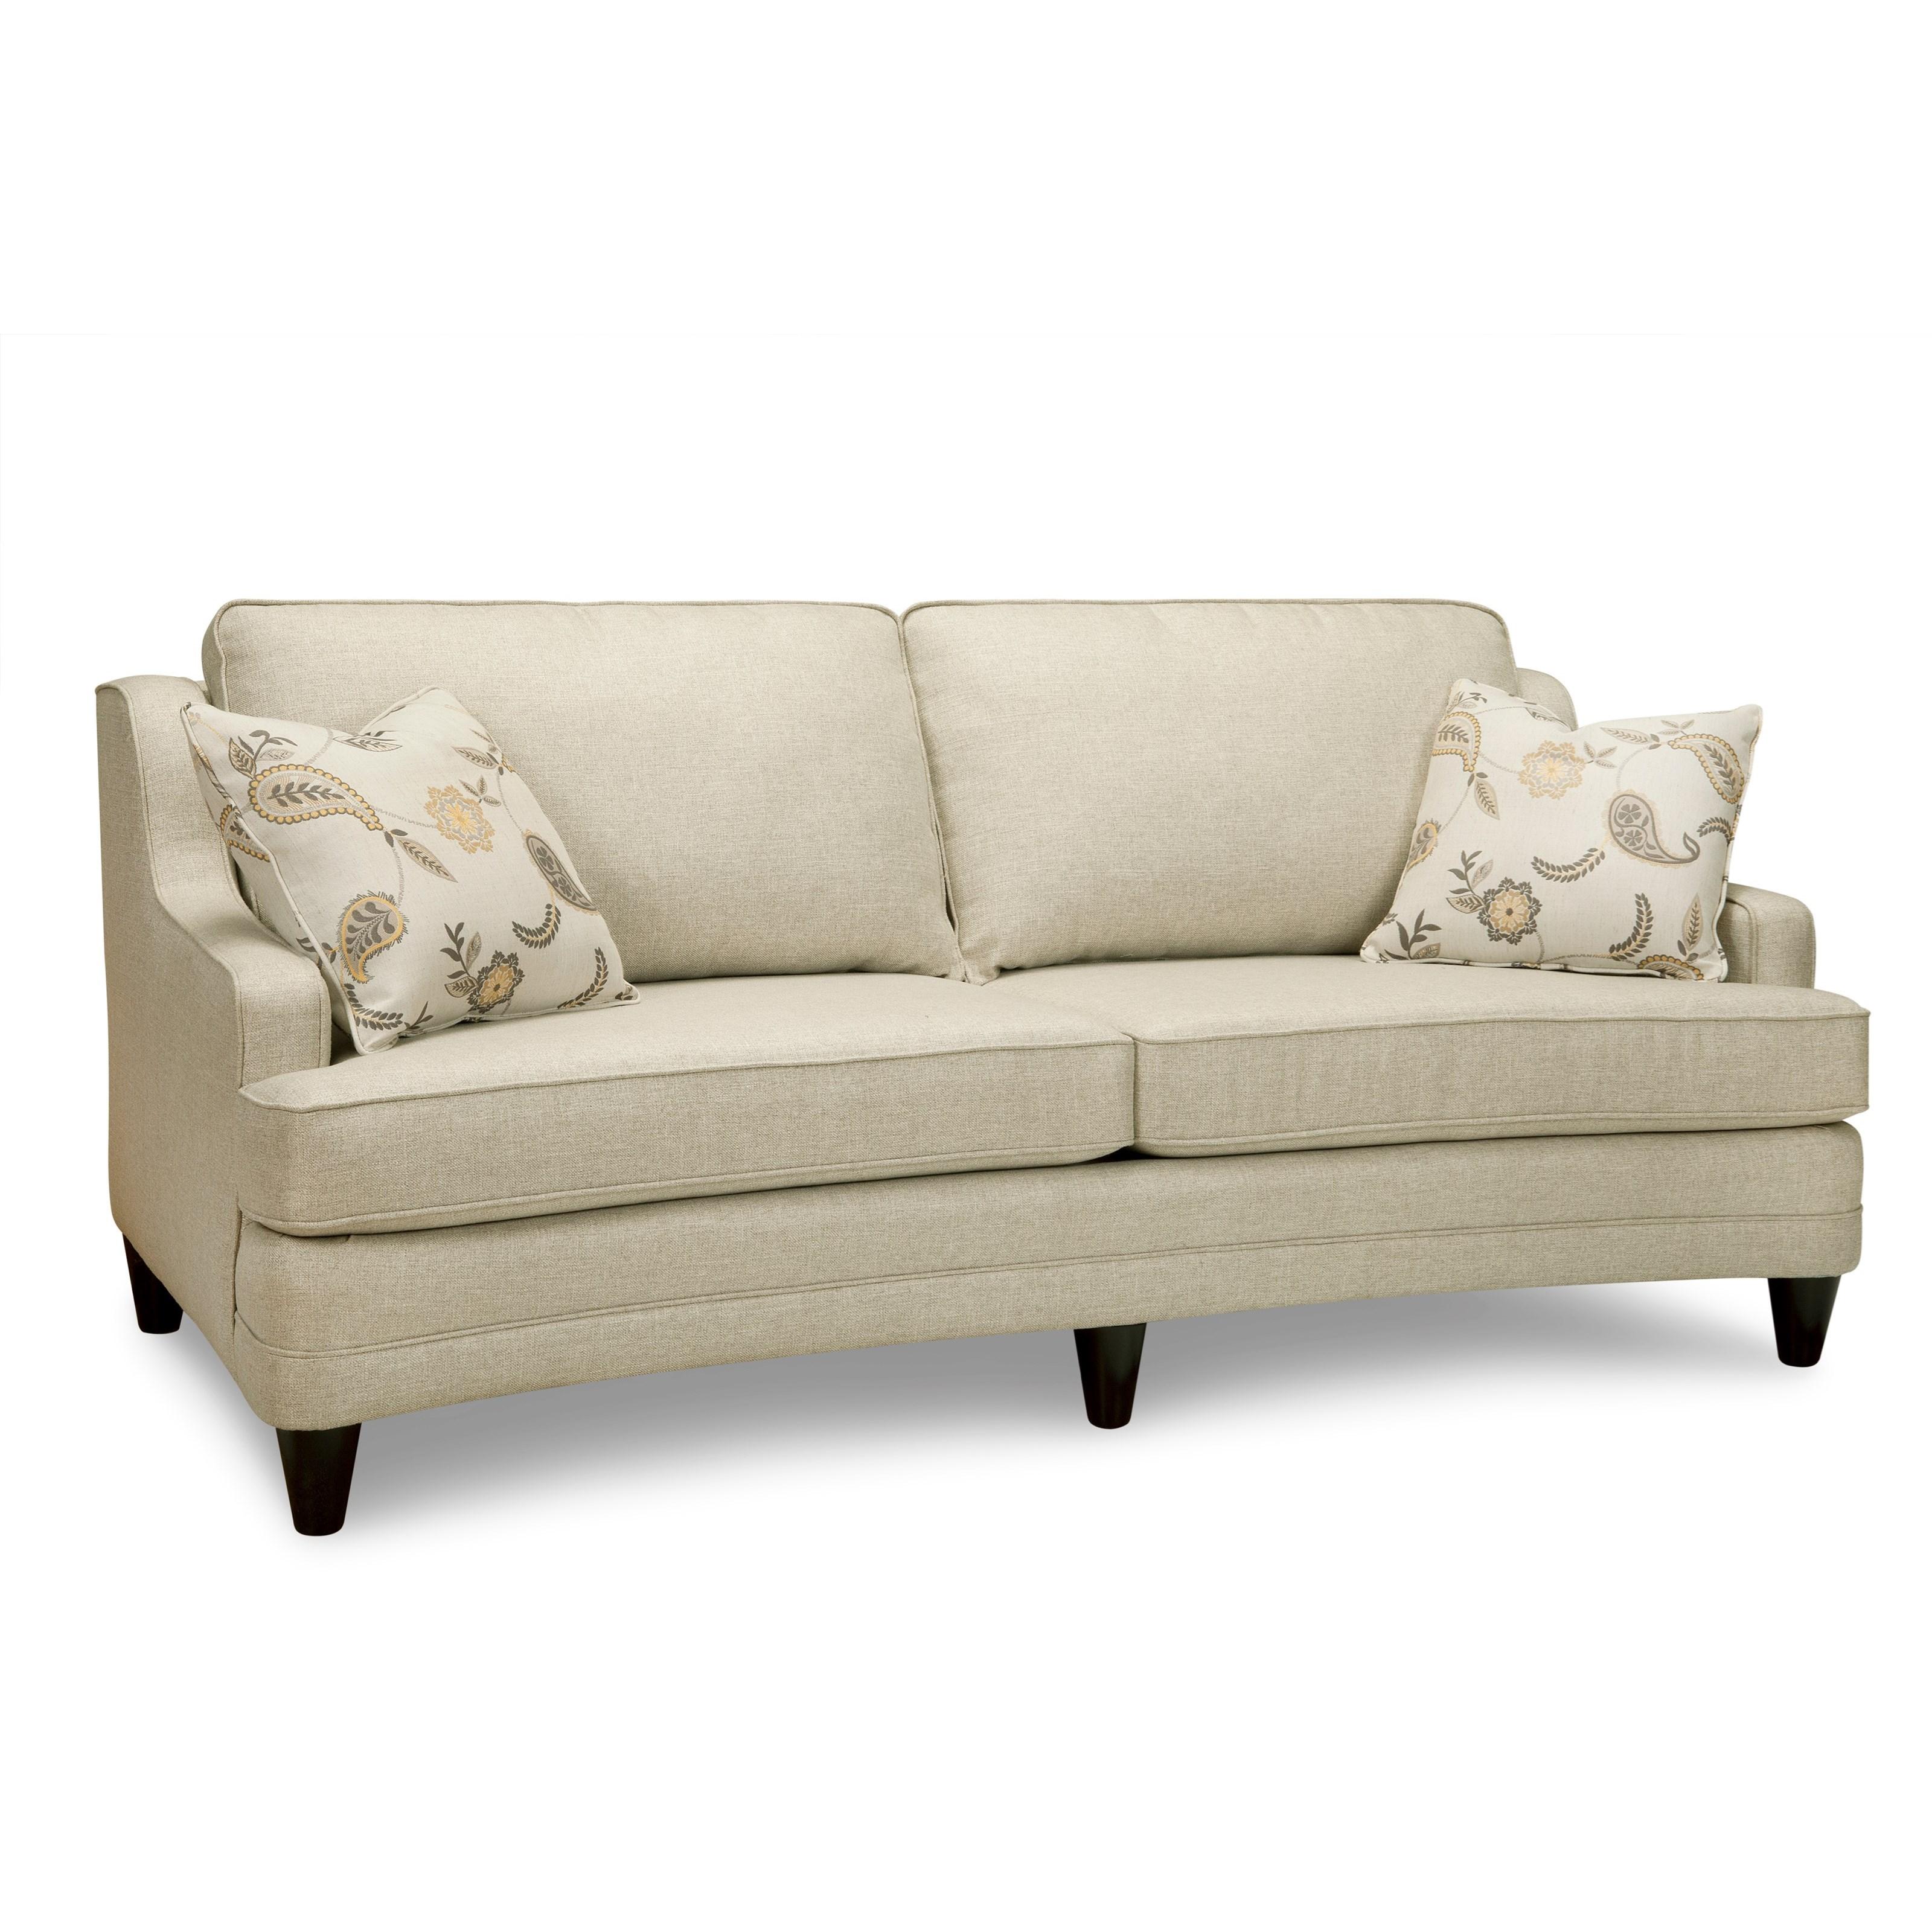 thayer coggin clip sofa best bed mattress canada circular baci living room